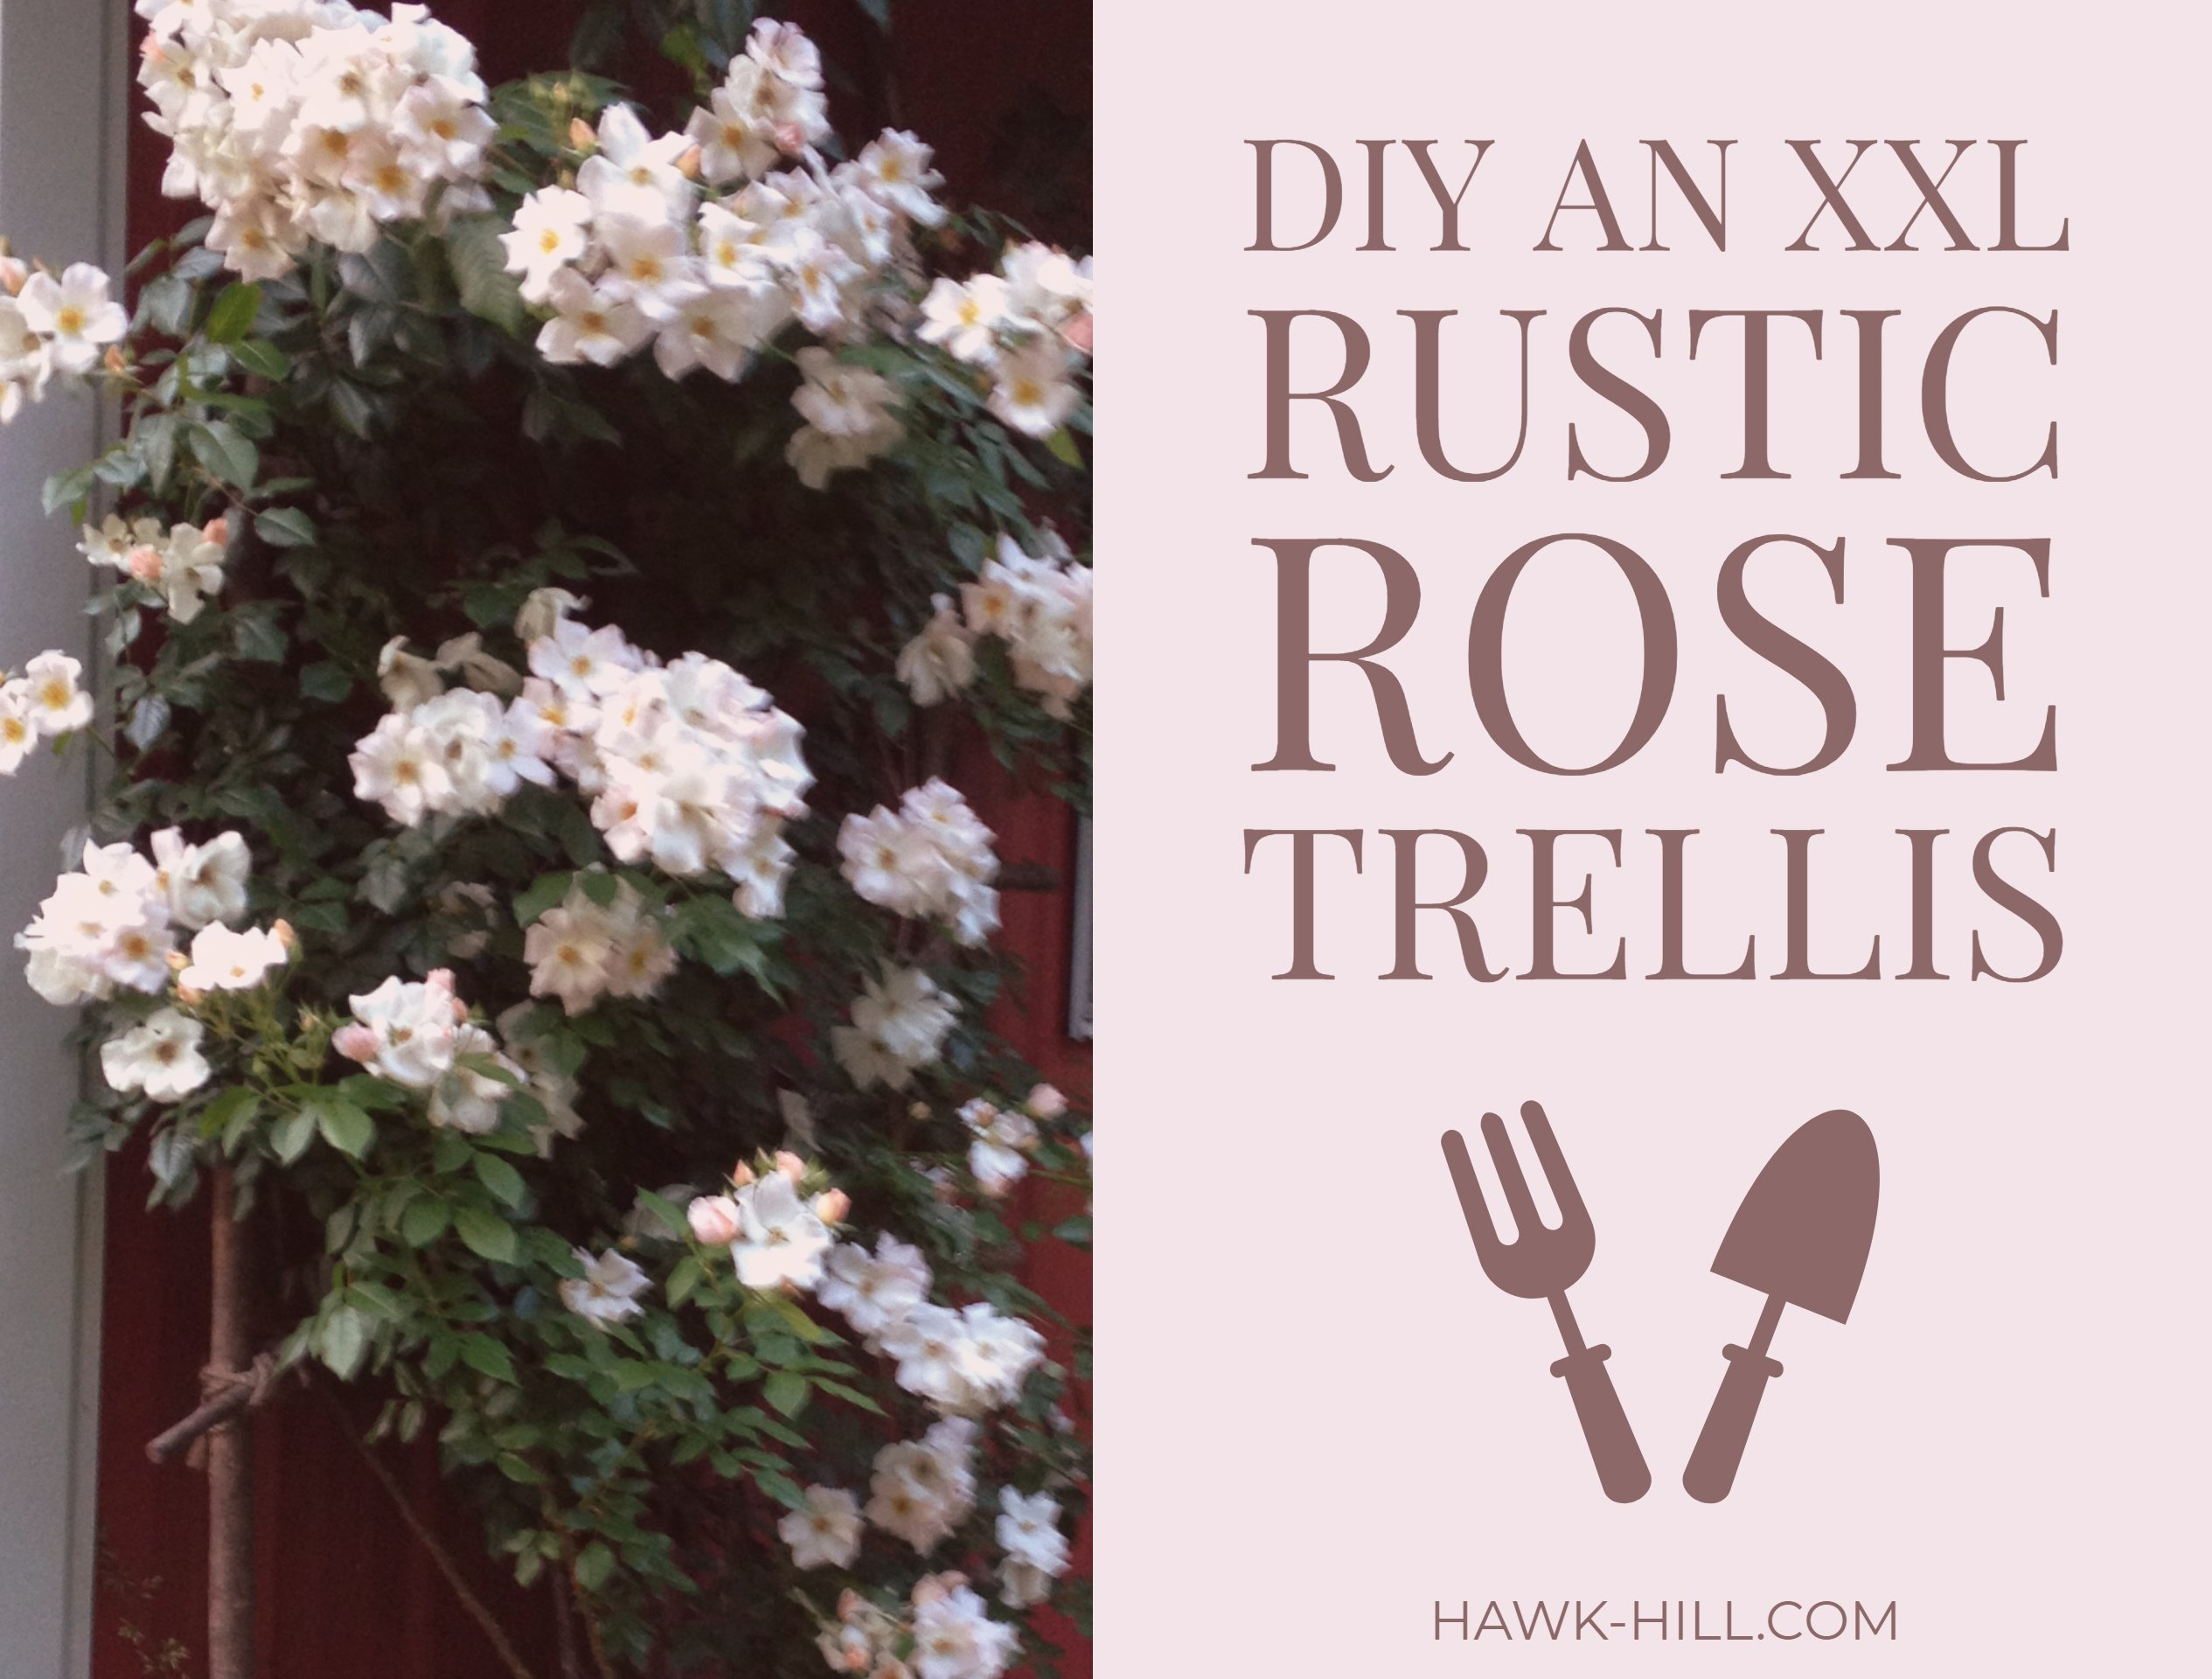 How to make a huge rustic DIY rose trellis using free materials